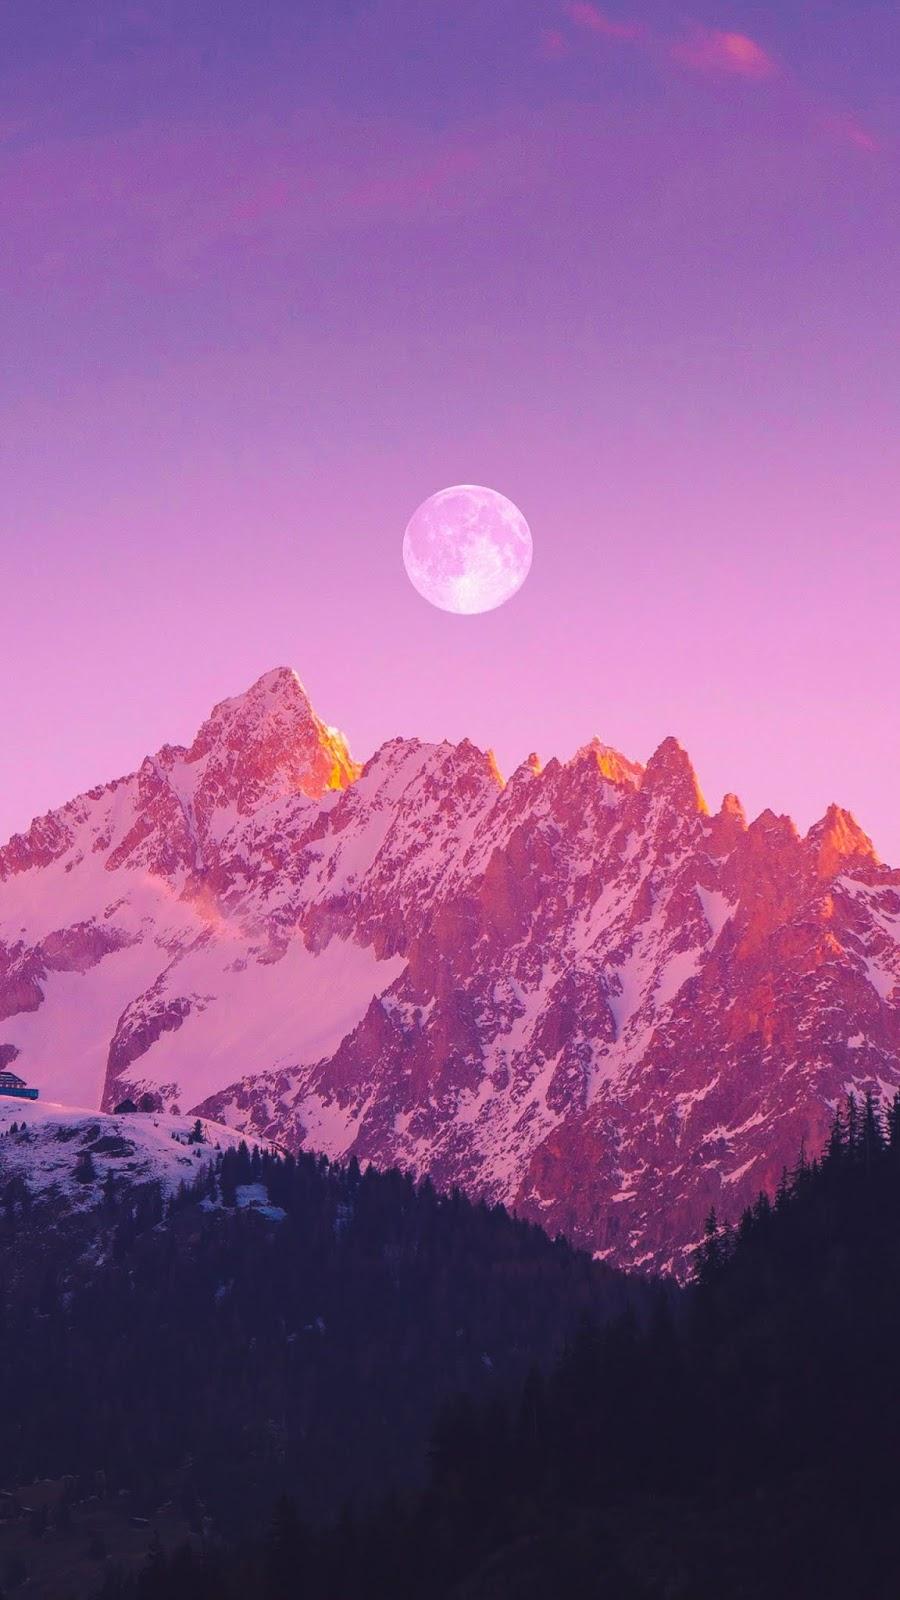 Full moon in the twilight sky